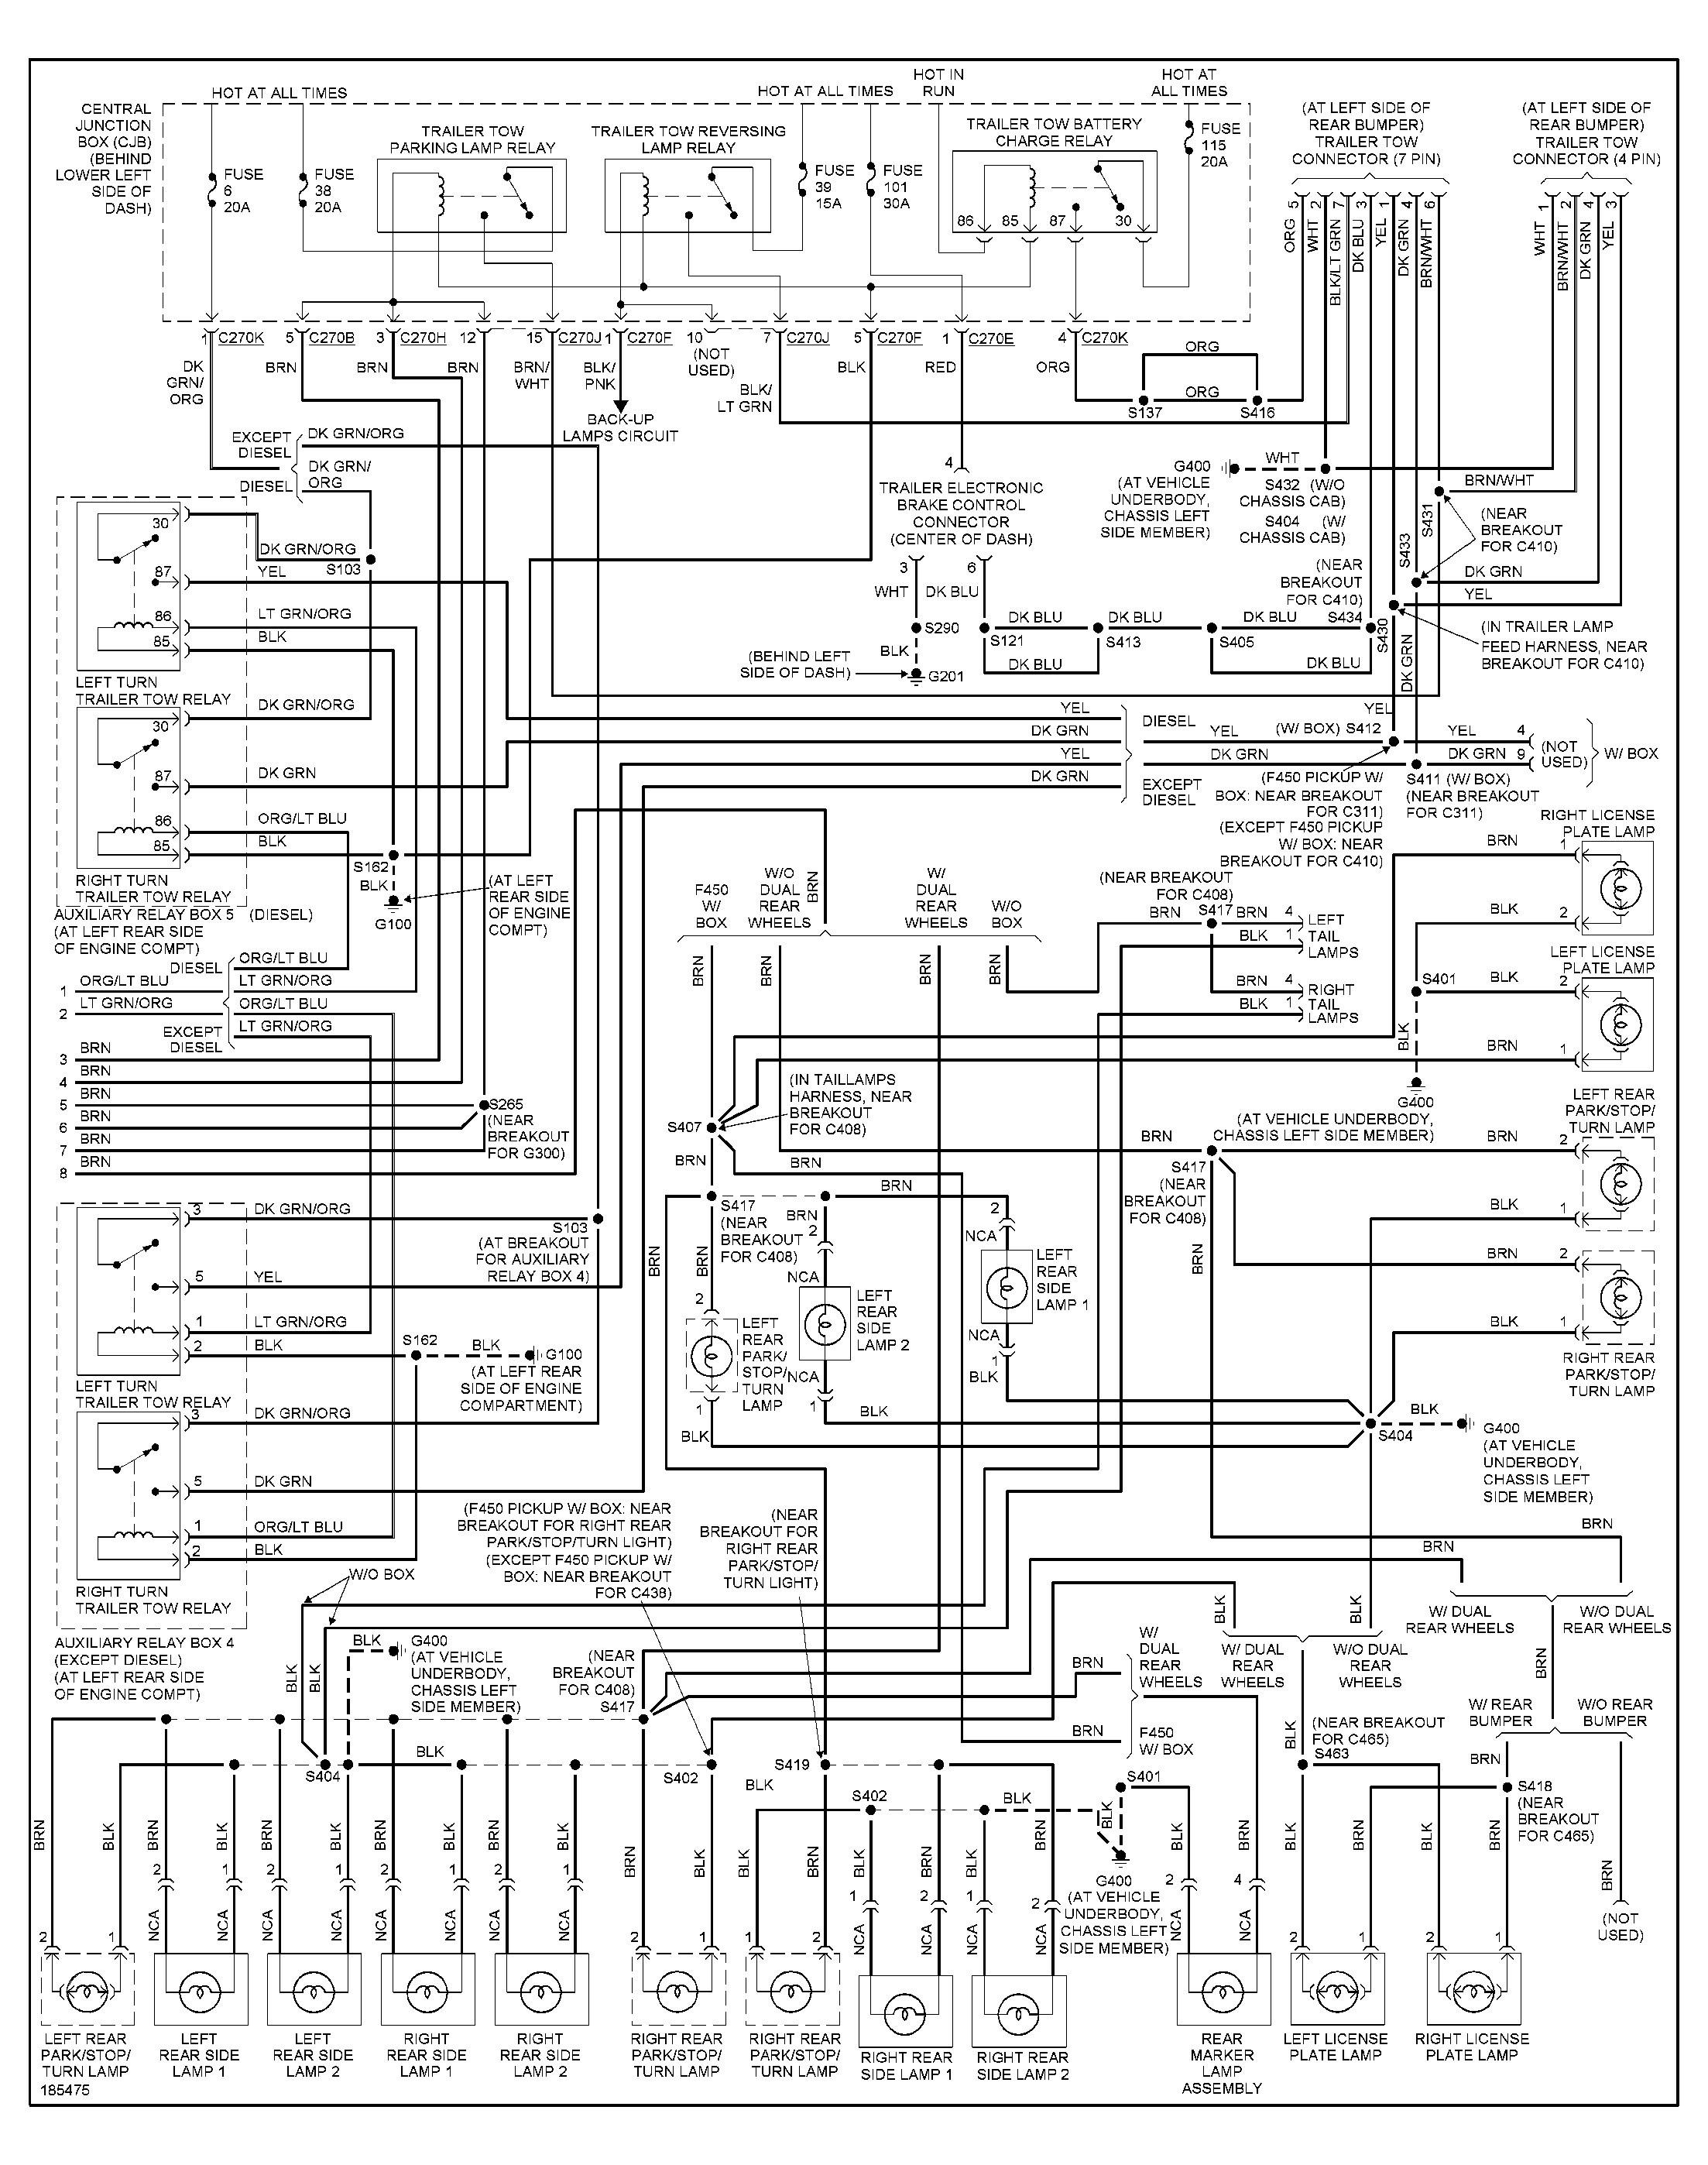 Diagram 2000 Mercury Cougar Headlight Wiring Diagram Full Version Hd Quality Wiring Diagram Diagramssean Tomari It